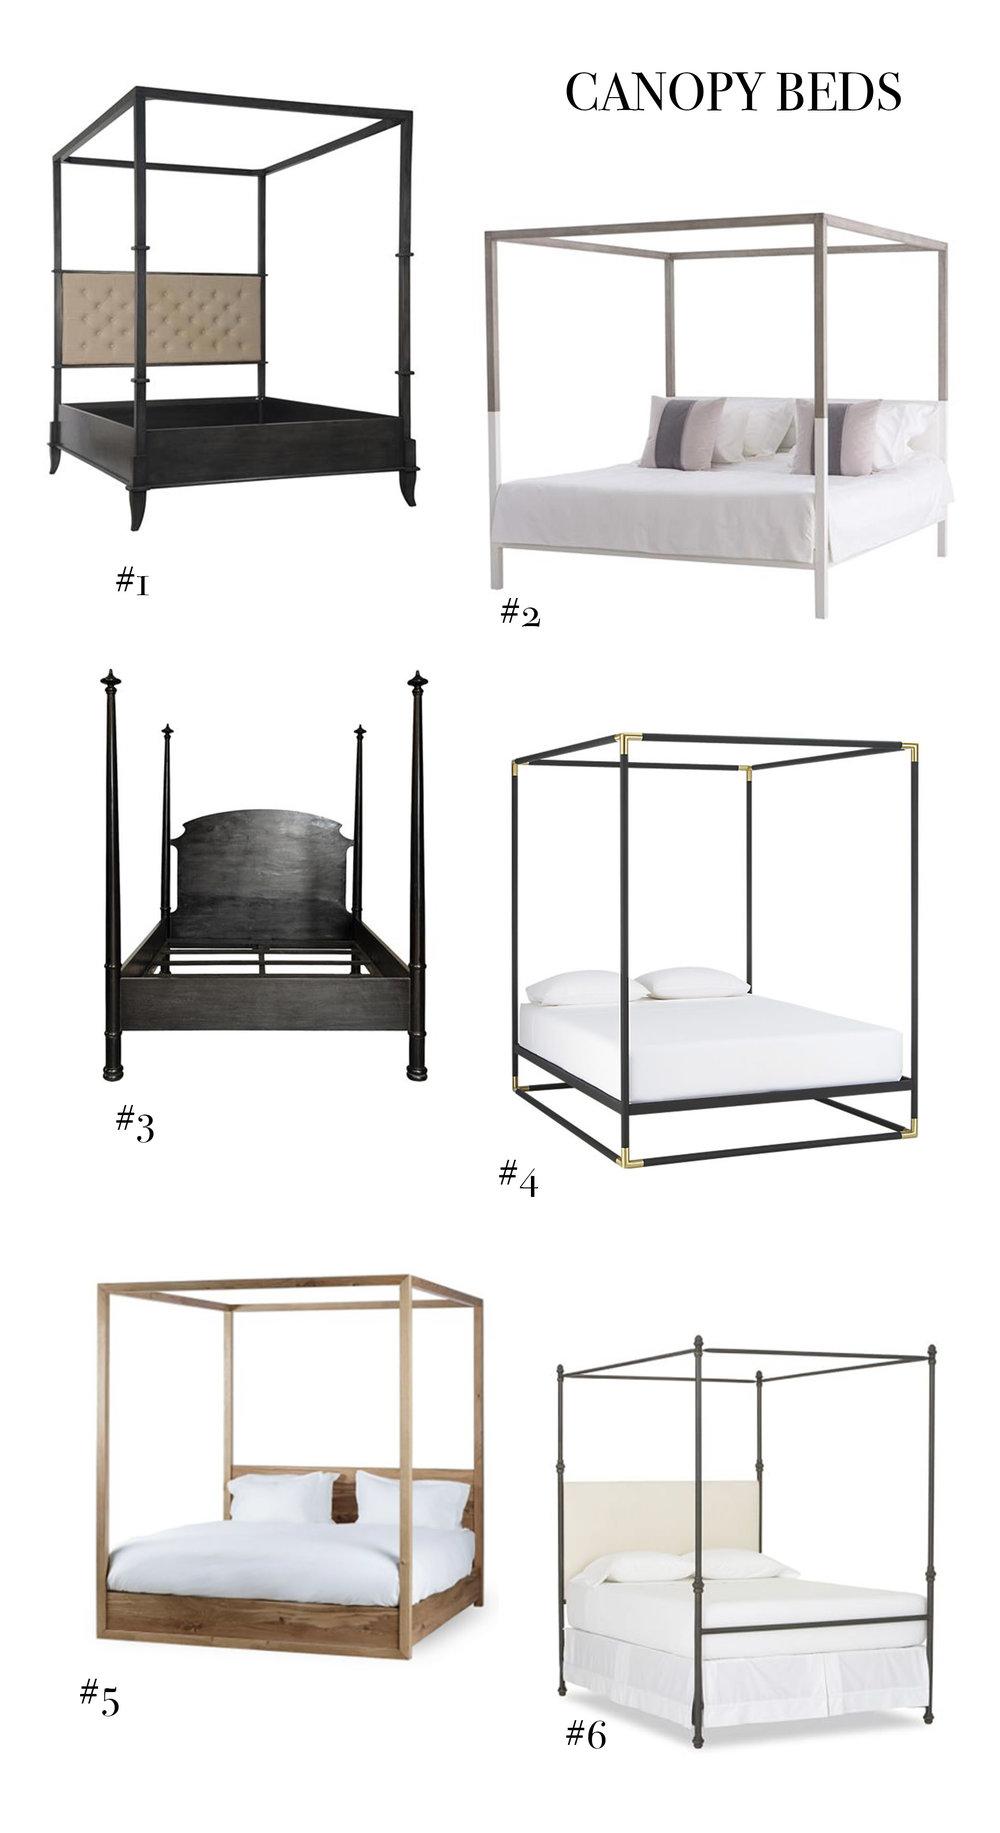 canopy beds.jpg